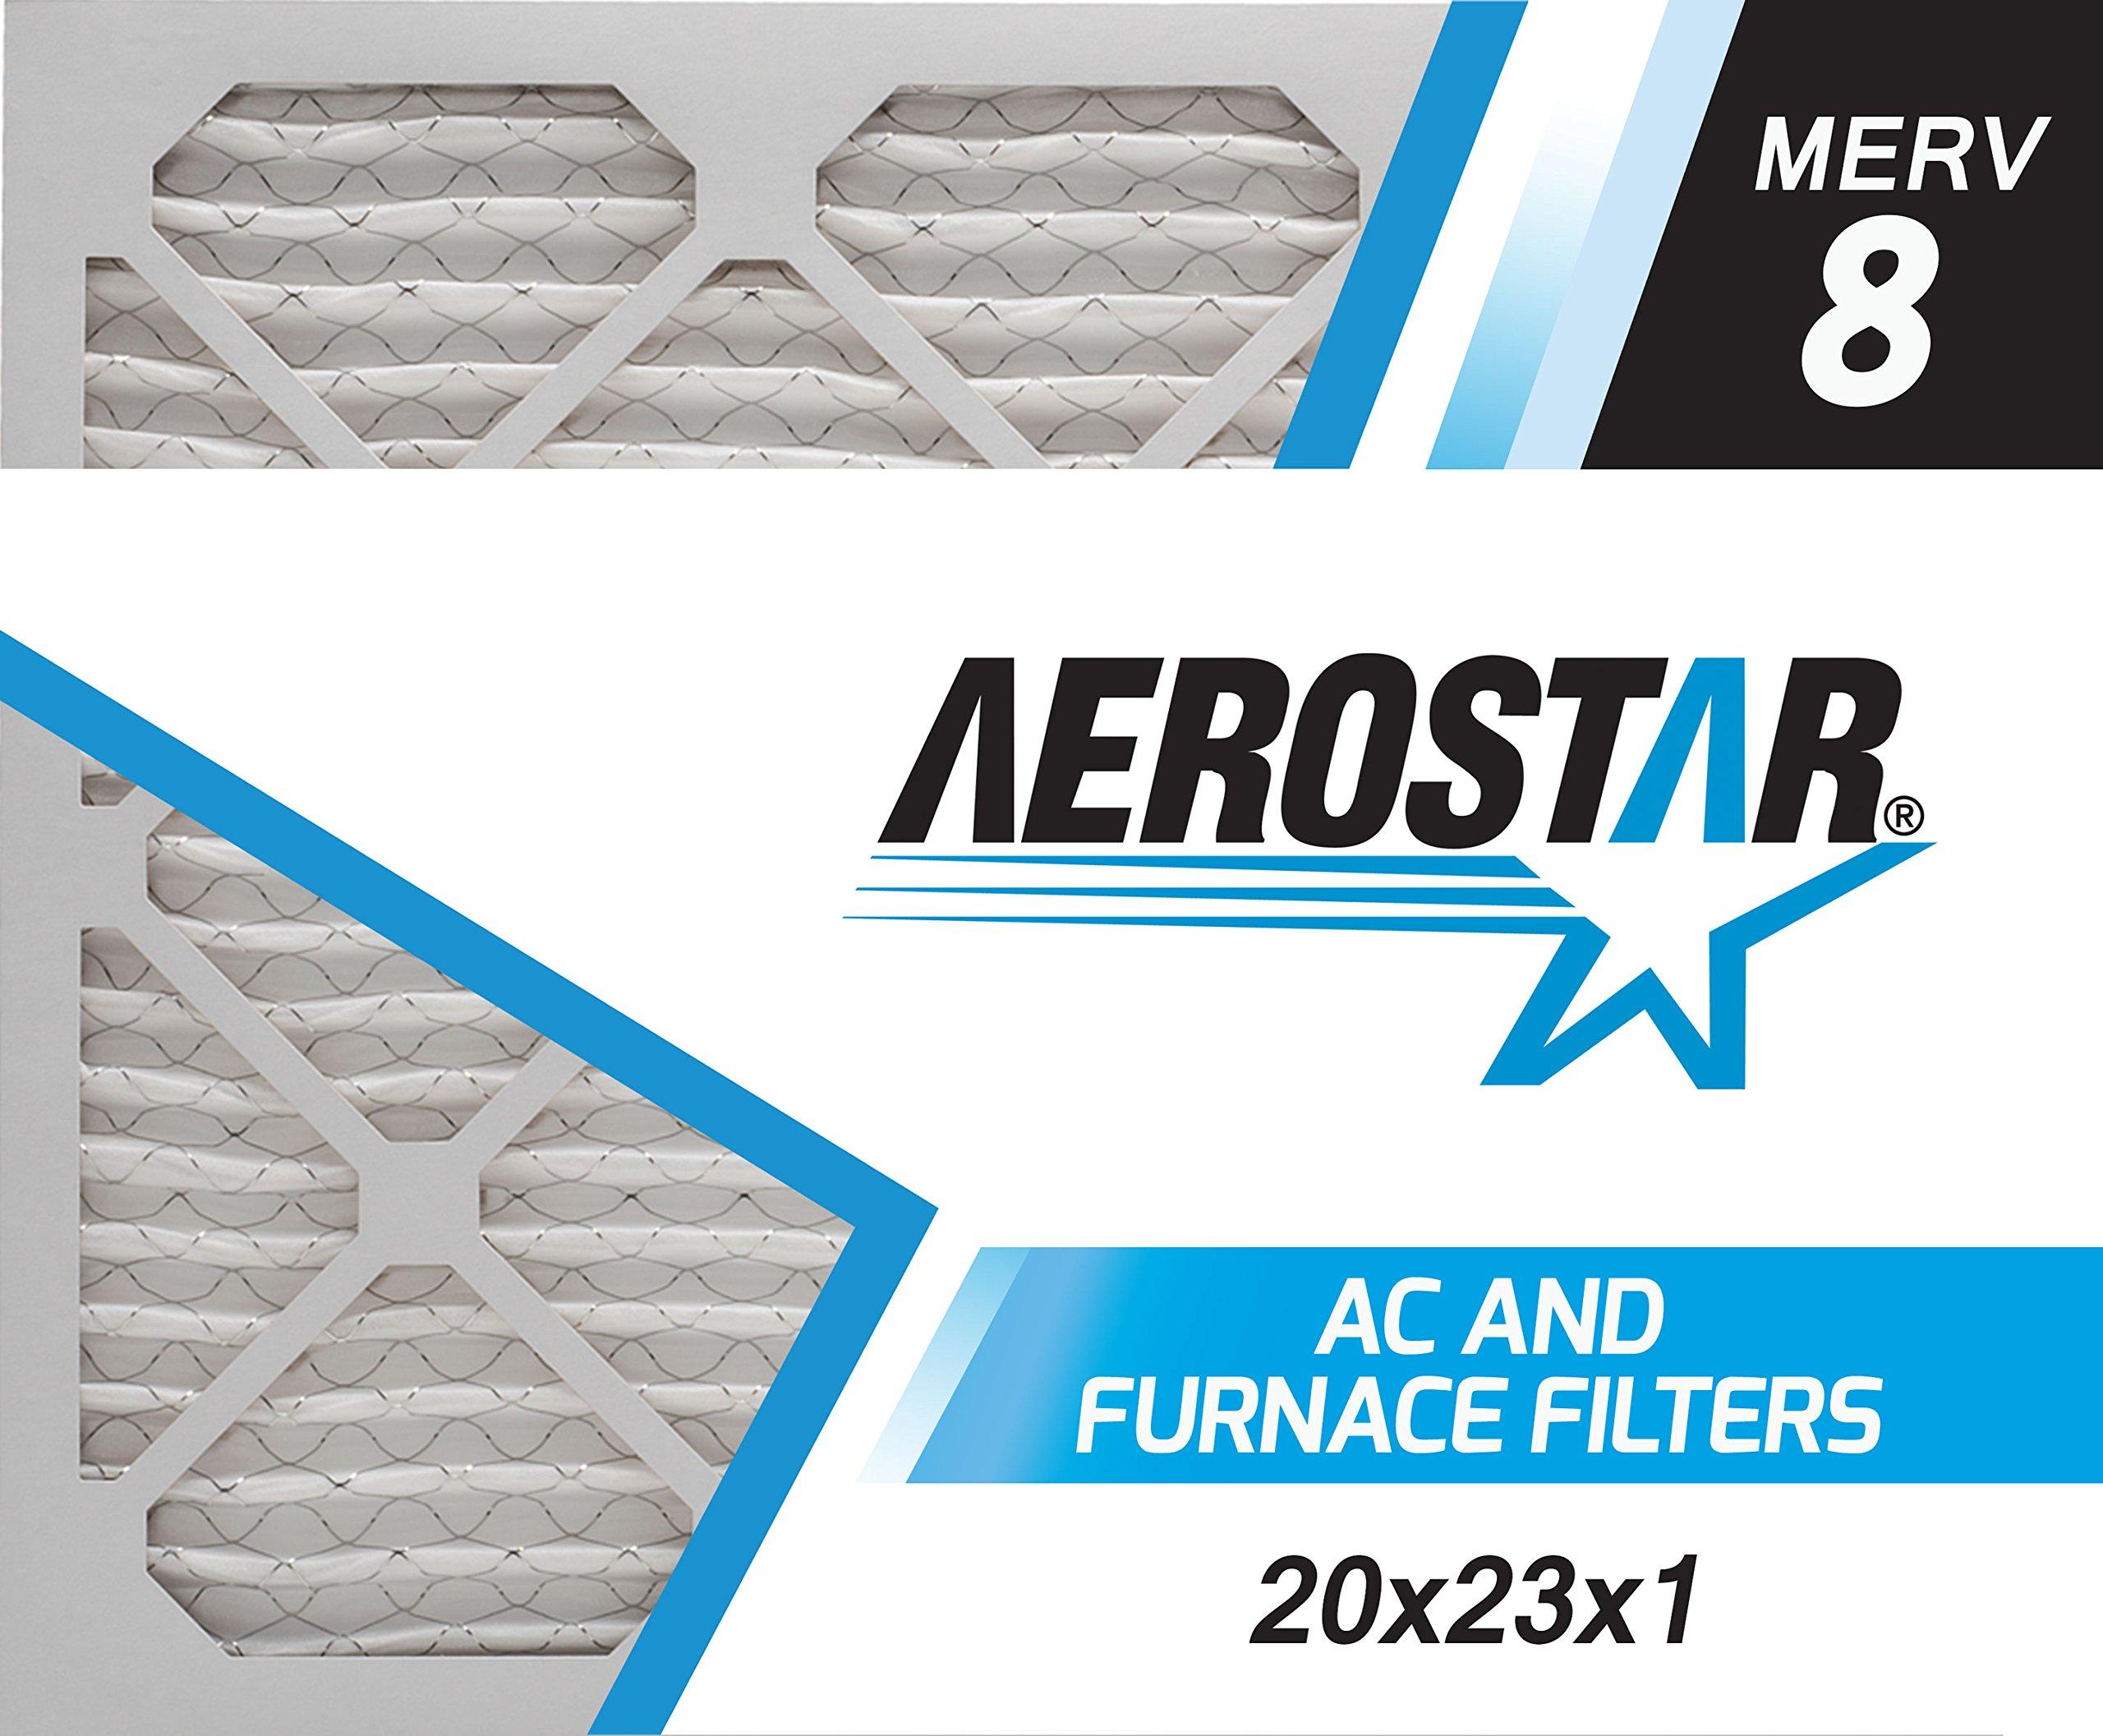 20x23x1 Pack of 6 Filters FilterBuy 20x23x1 MERV 8 Pleated AC Furnace Air Filter, Silver AFB20x23x1M8pk6